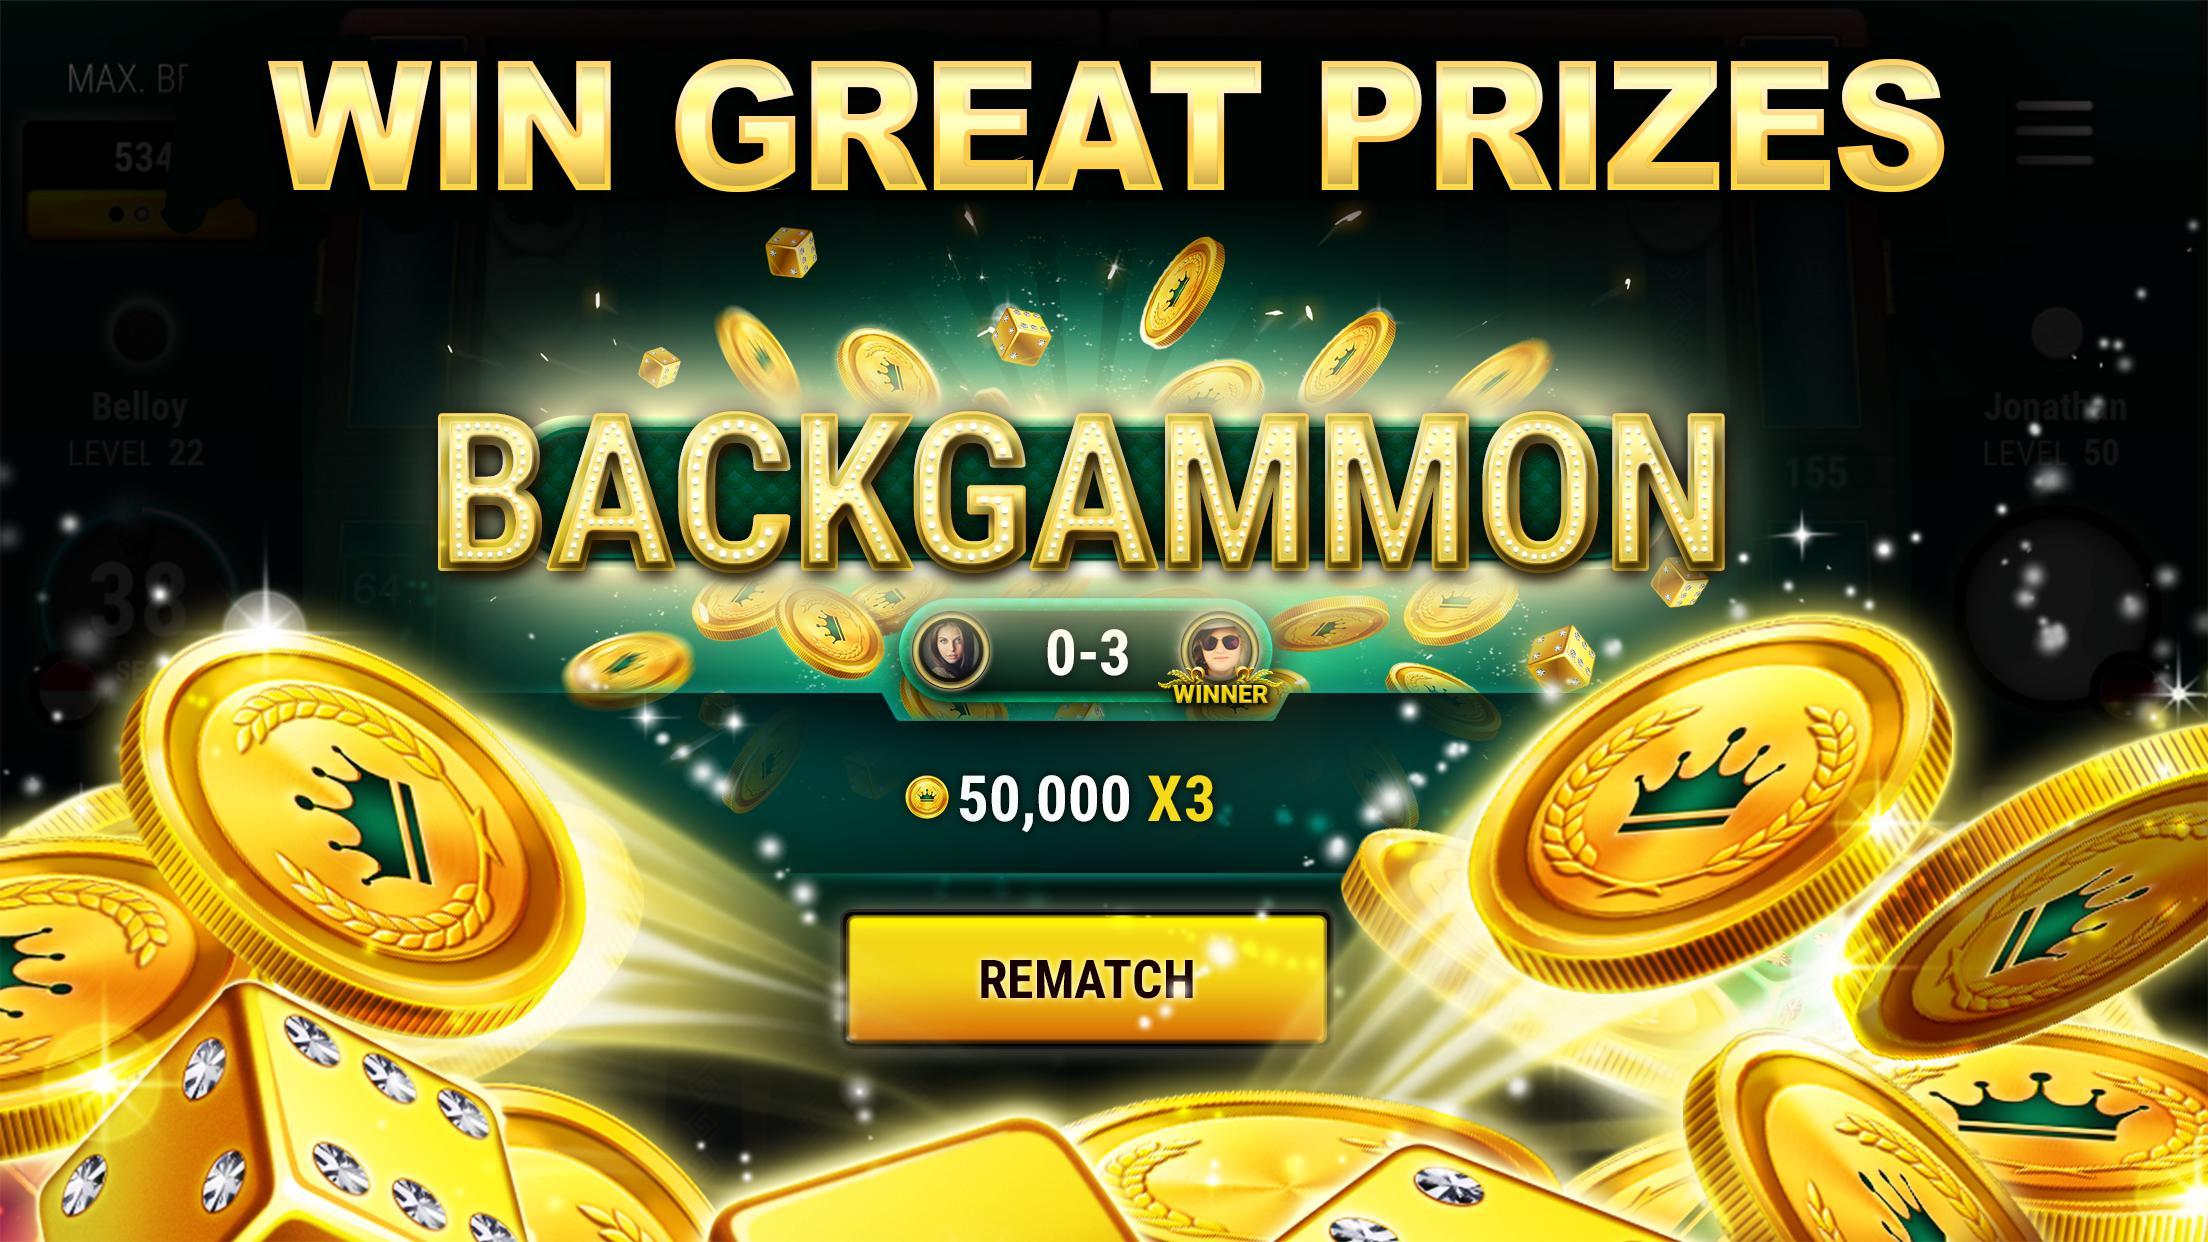 Backgammon Live - Play Online Free Backgammon 3.5.245 Screenshot 7